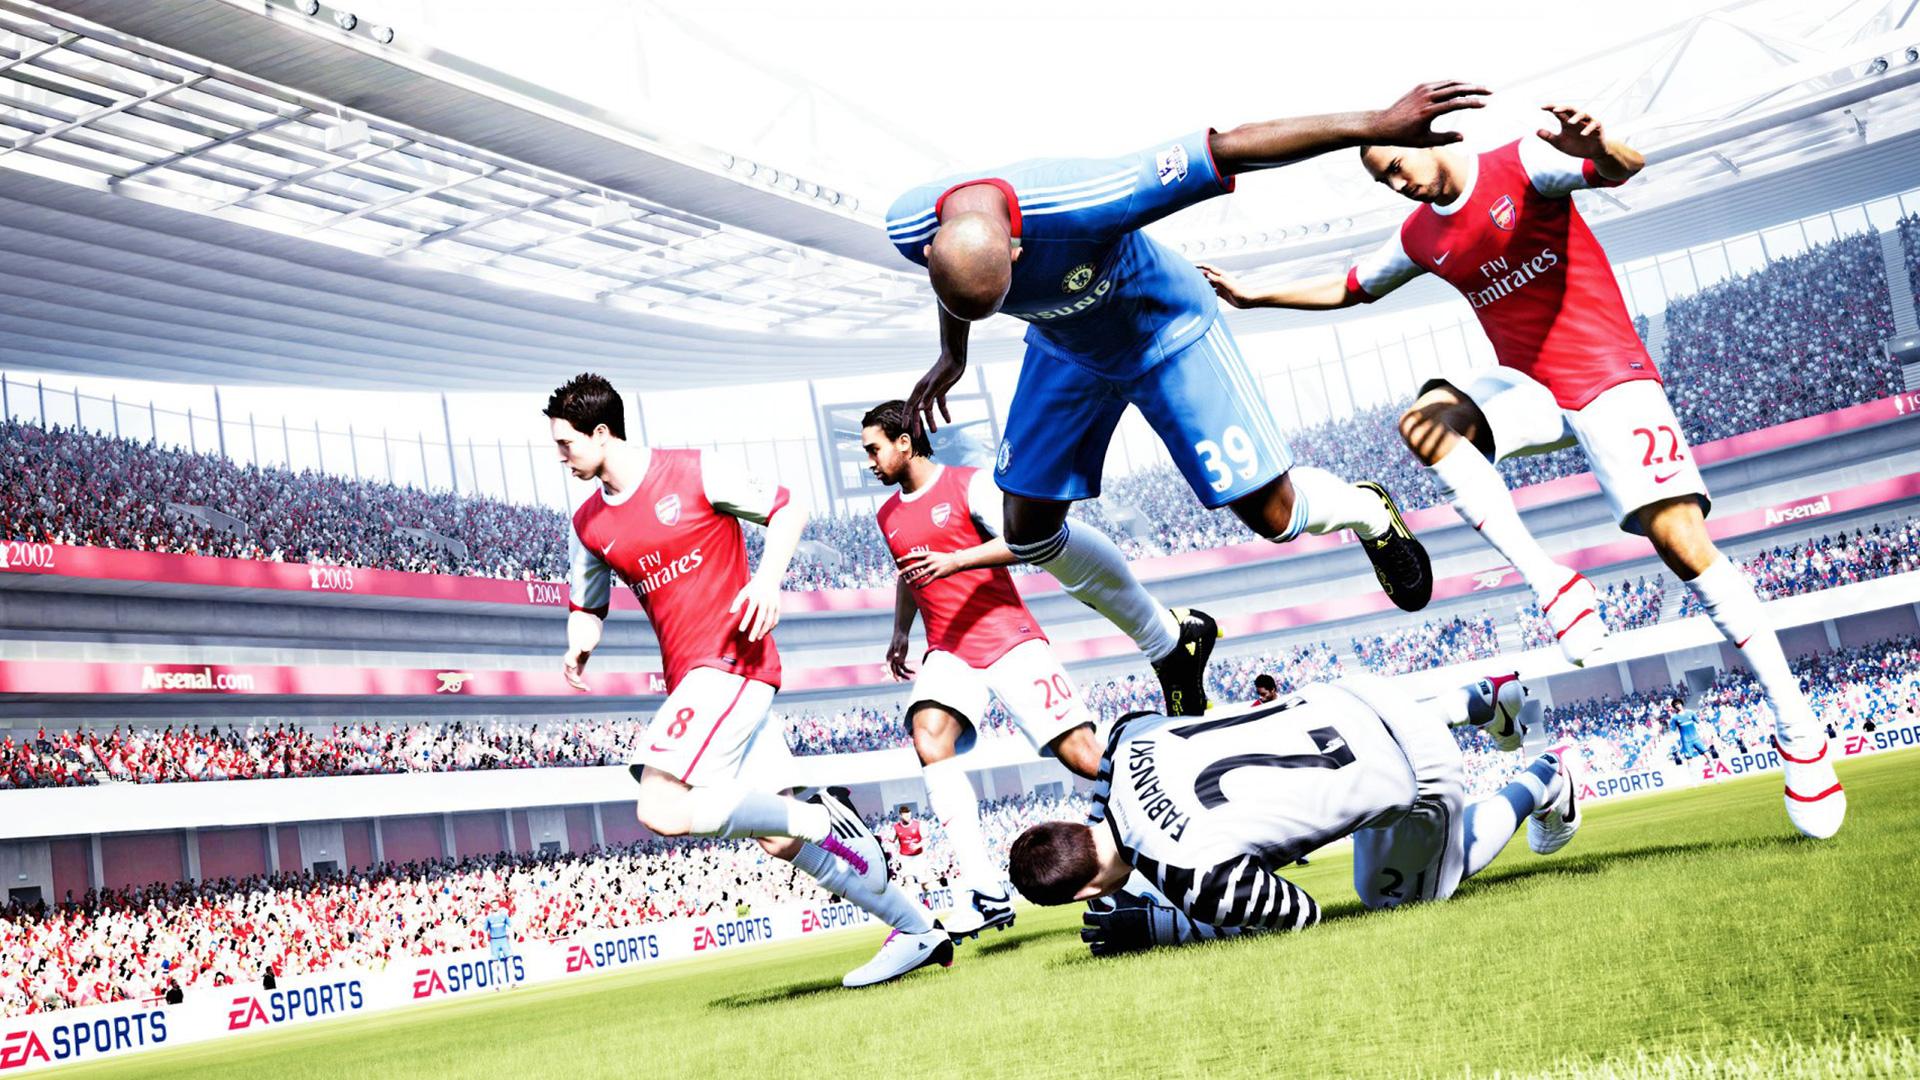 FIFA 12 Wallpaper in 1920x1080